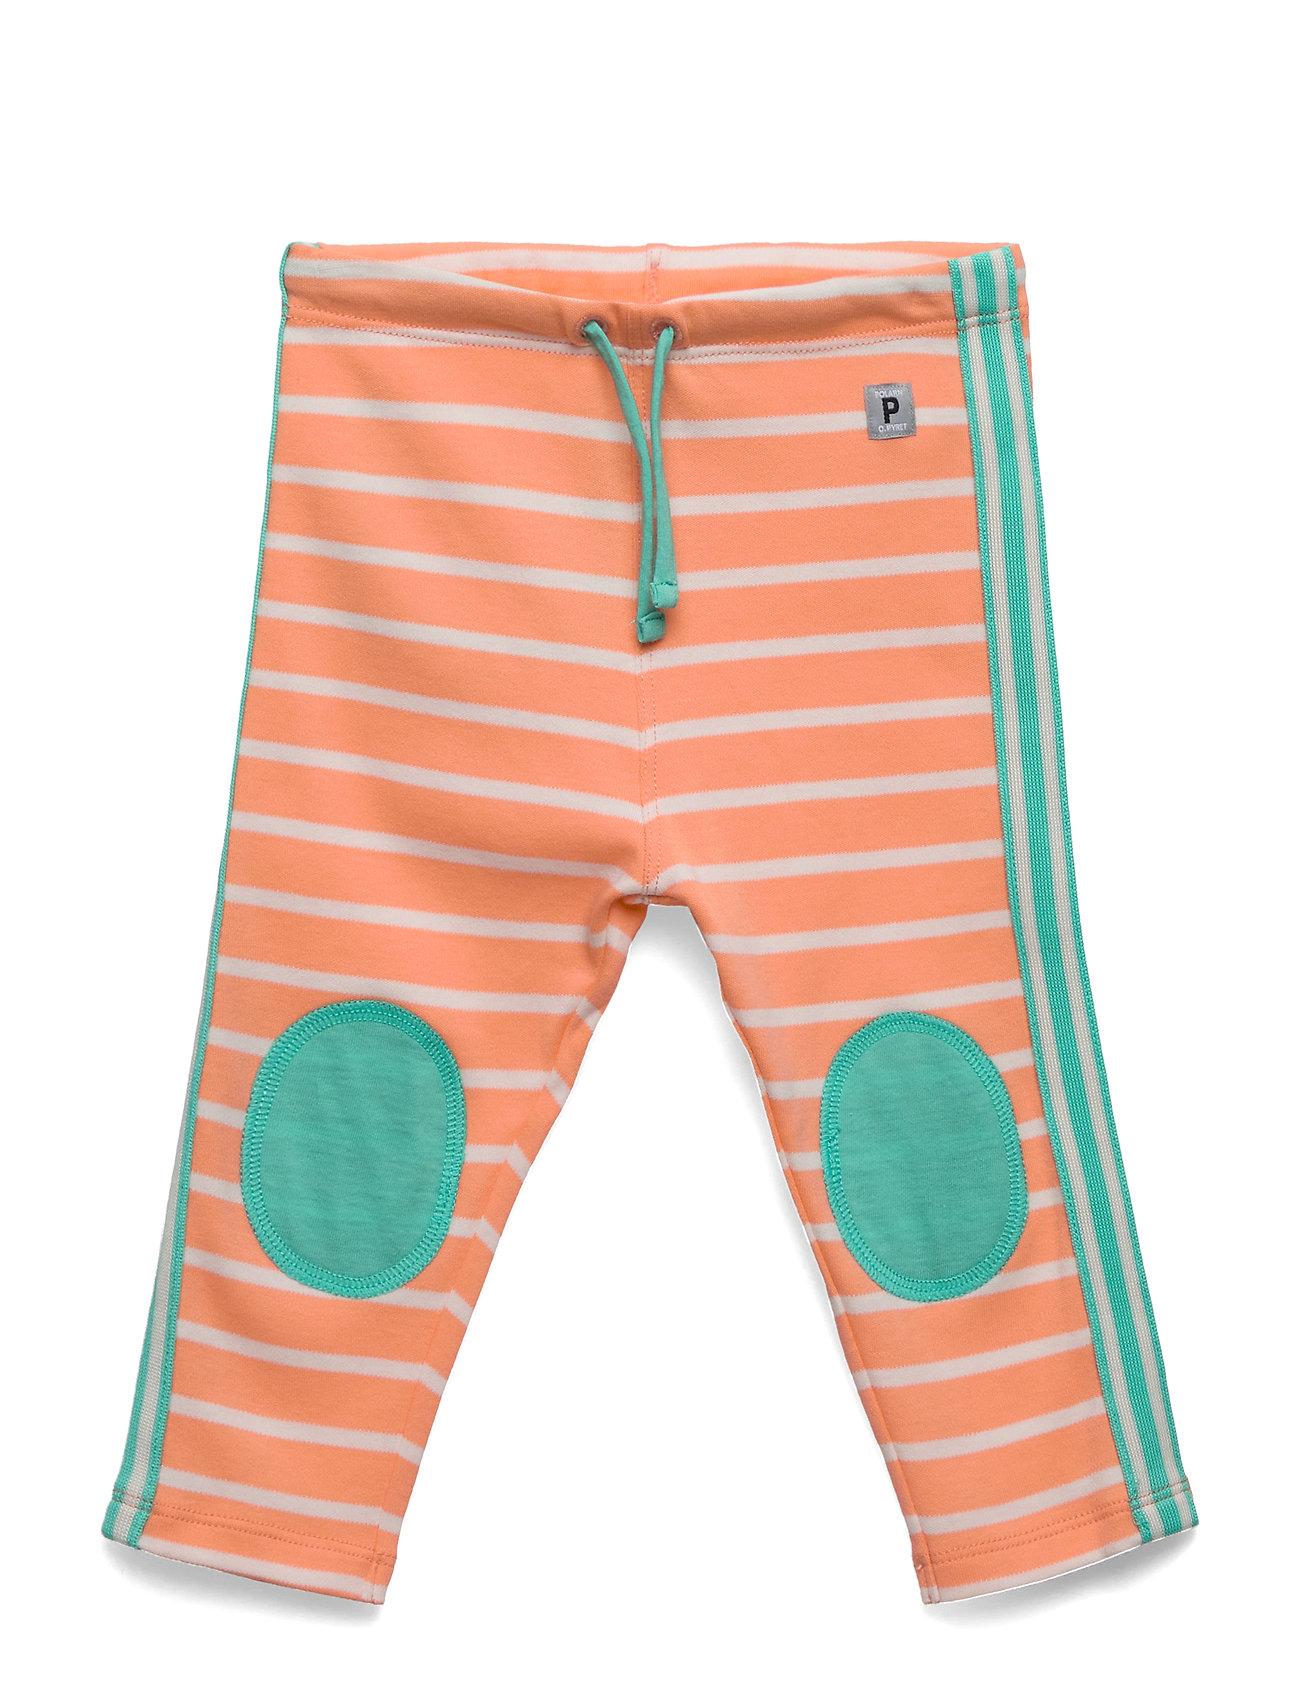 Polarn O. Pyret Trouser Jersey - CANTALOUPE